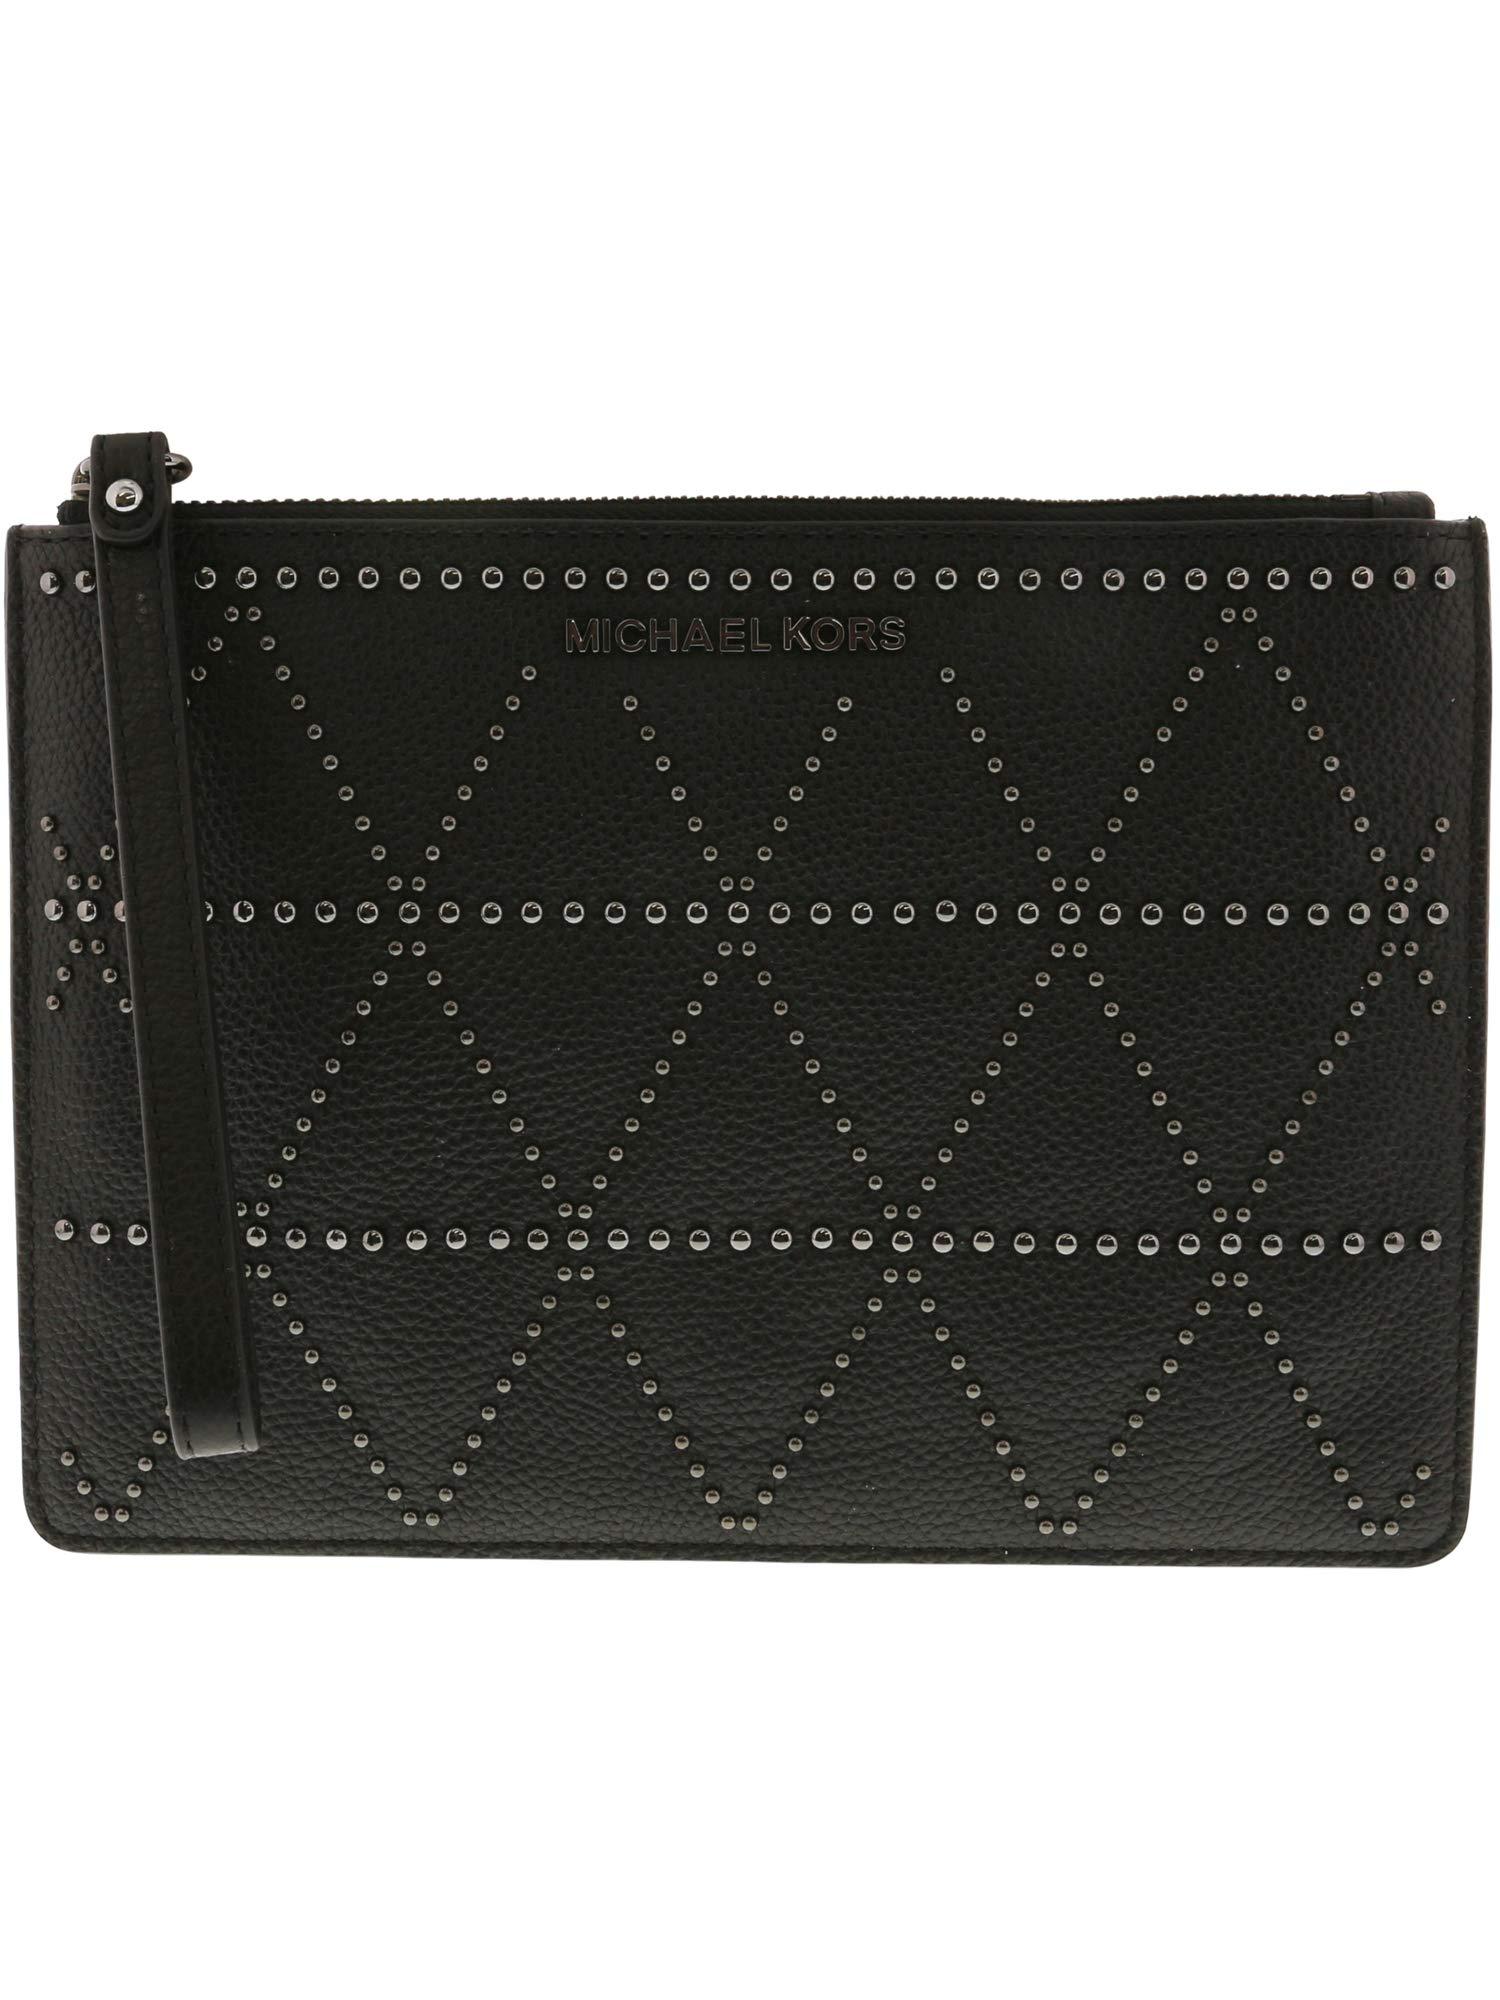 Michael Kors Adele Extra Large Leather Zip Clutch - Black